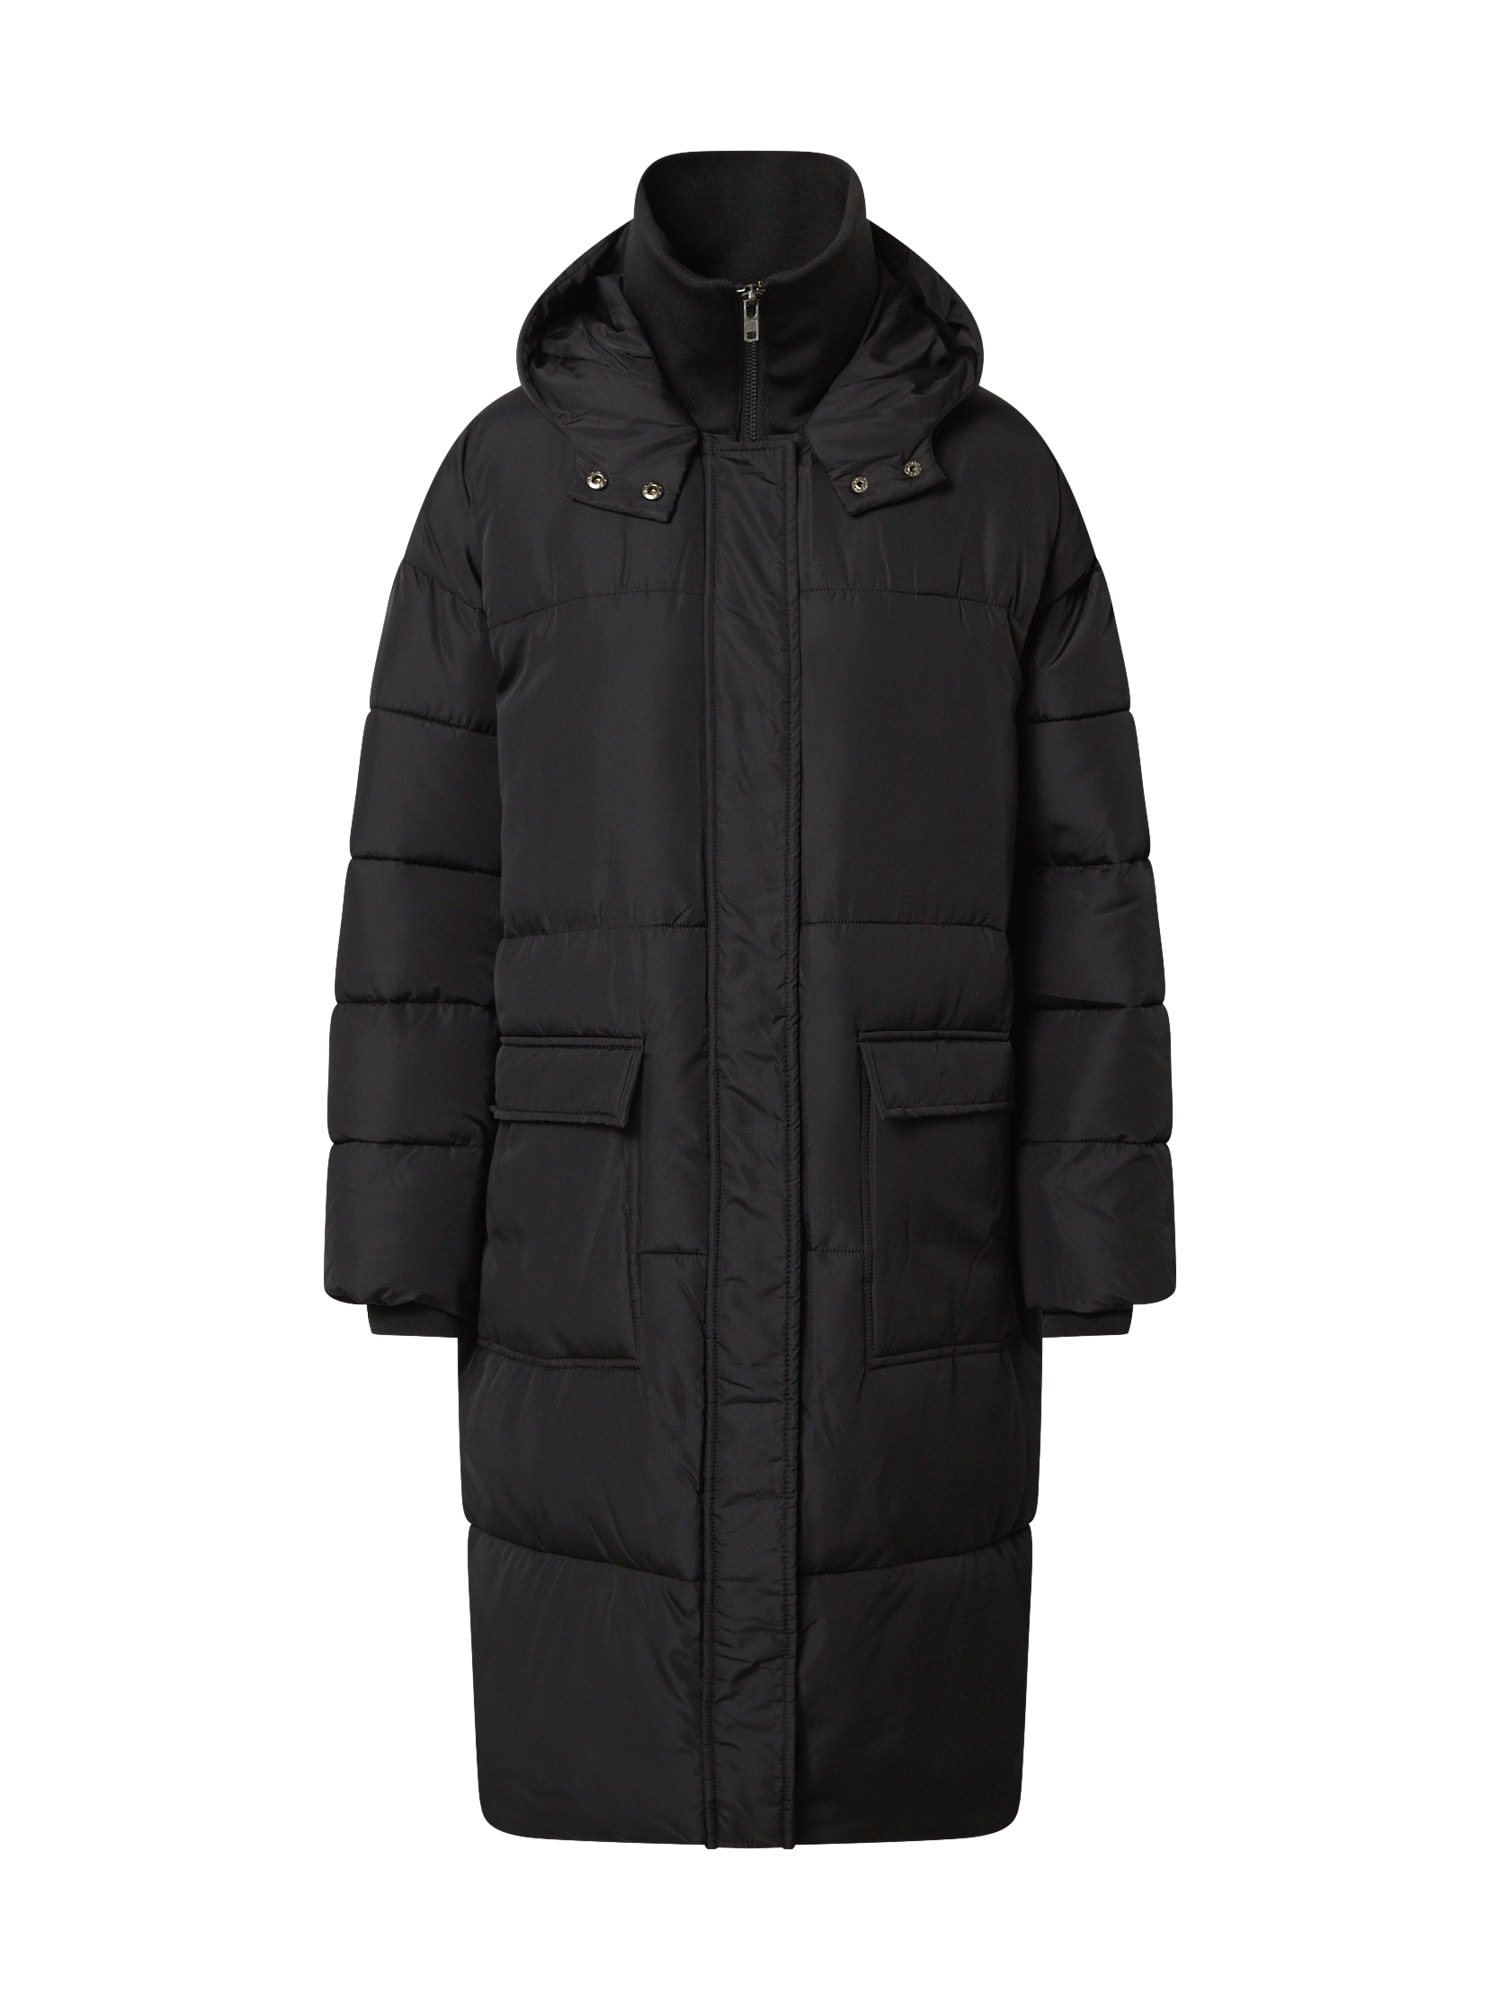 Soft Rebels Prechodná bunda  čierna